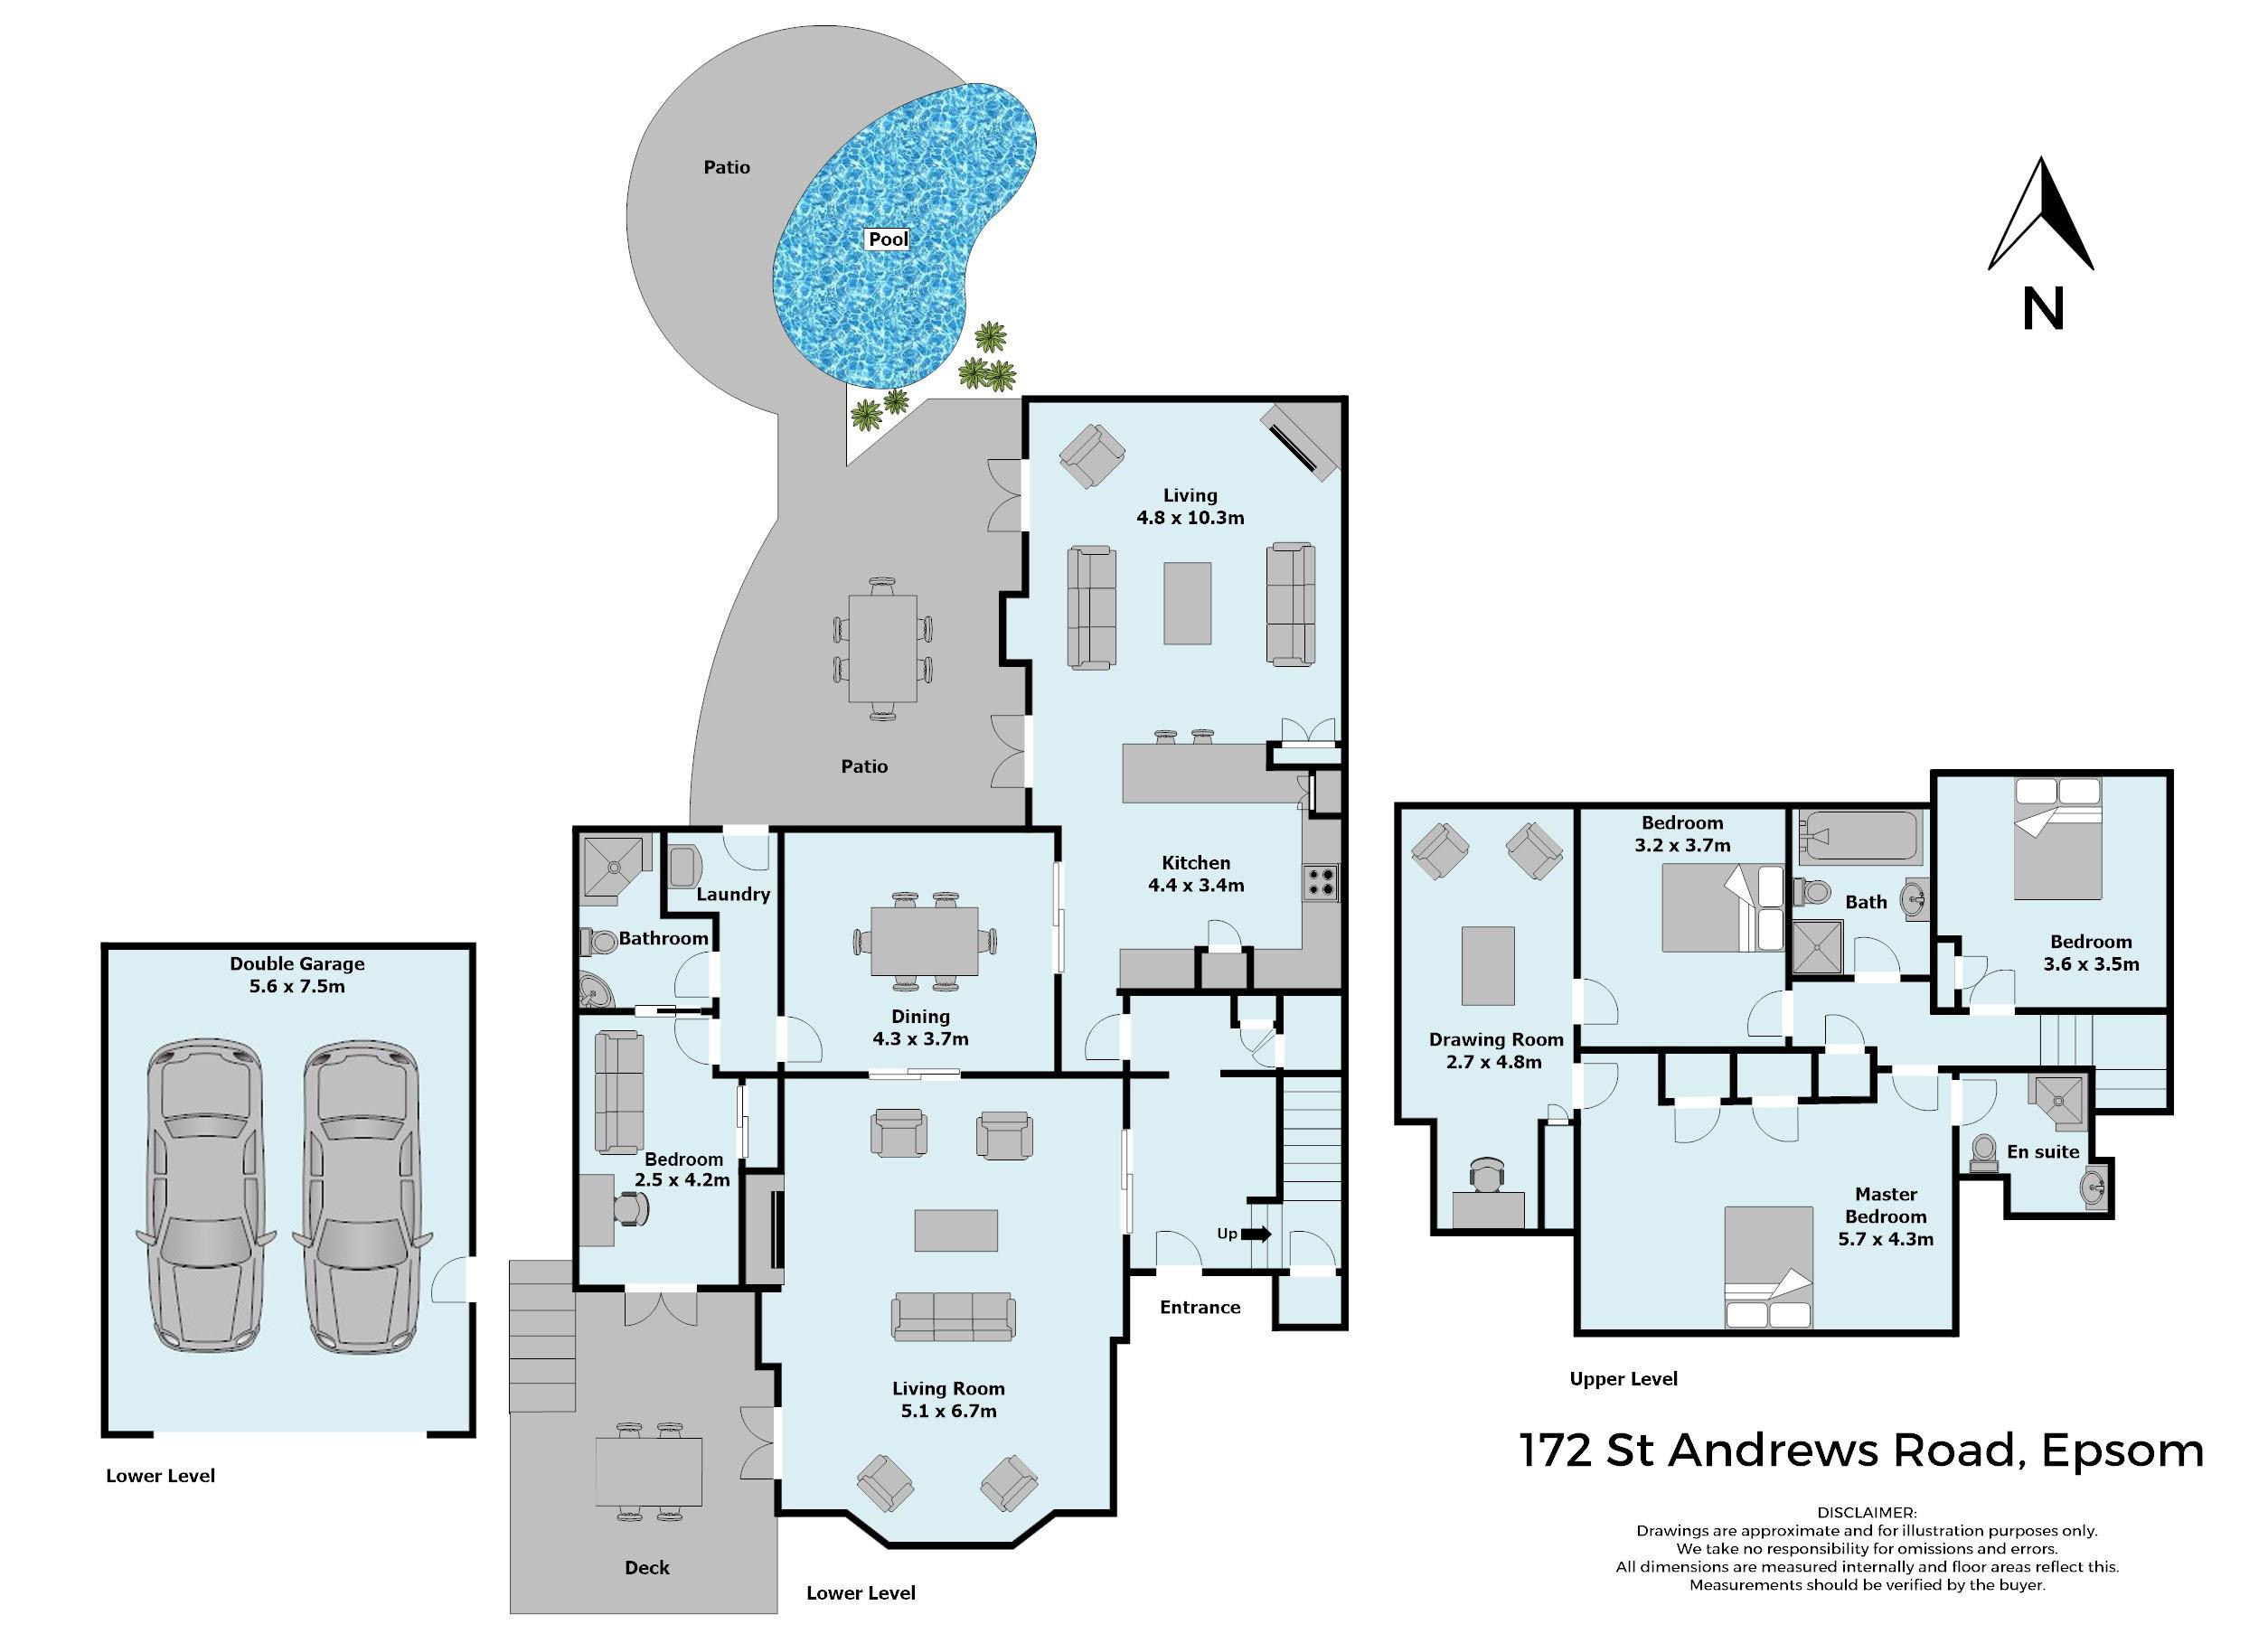 Floorplan or floor plan grammar onvacations wallpaper for Floorplan or floor plan